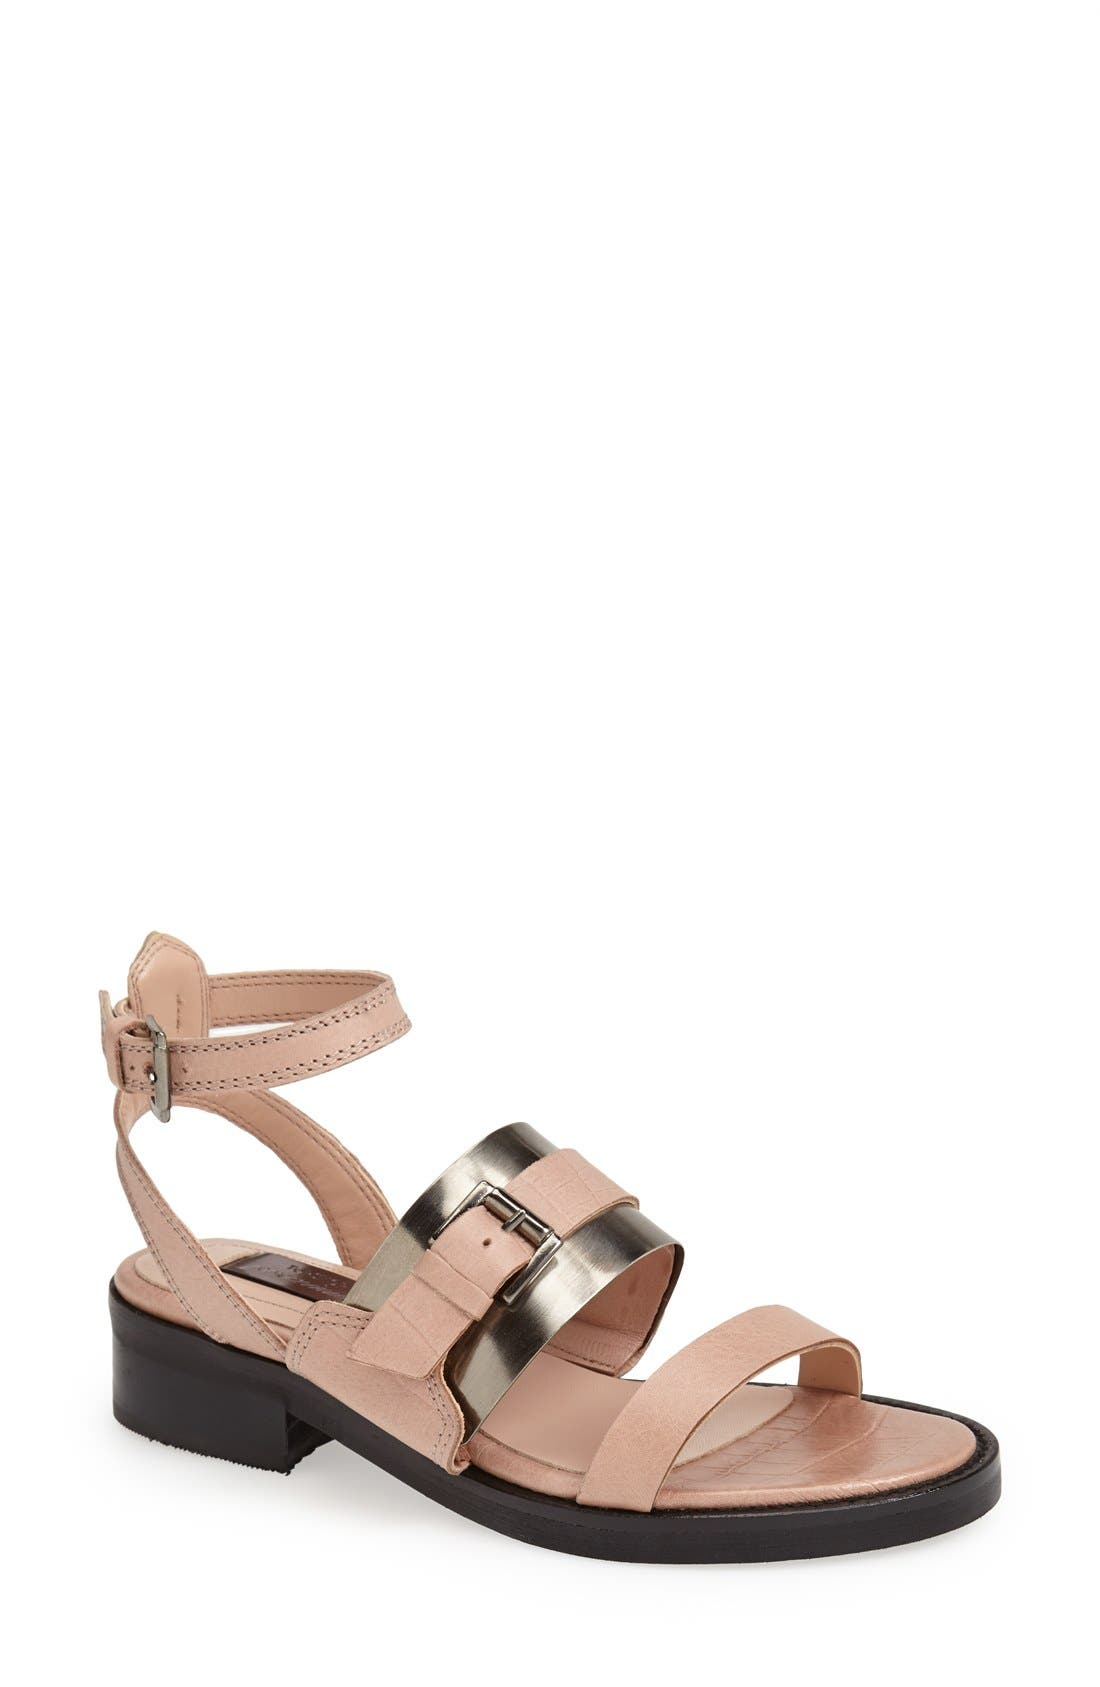 Alternate Image 1 Selected - Topshop 'Premium - Preeta' Ankle Strap Sandal (Women)